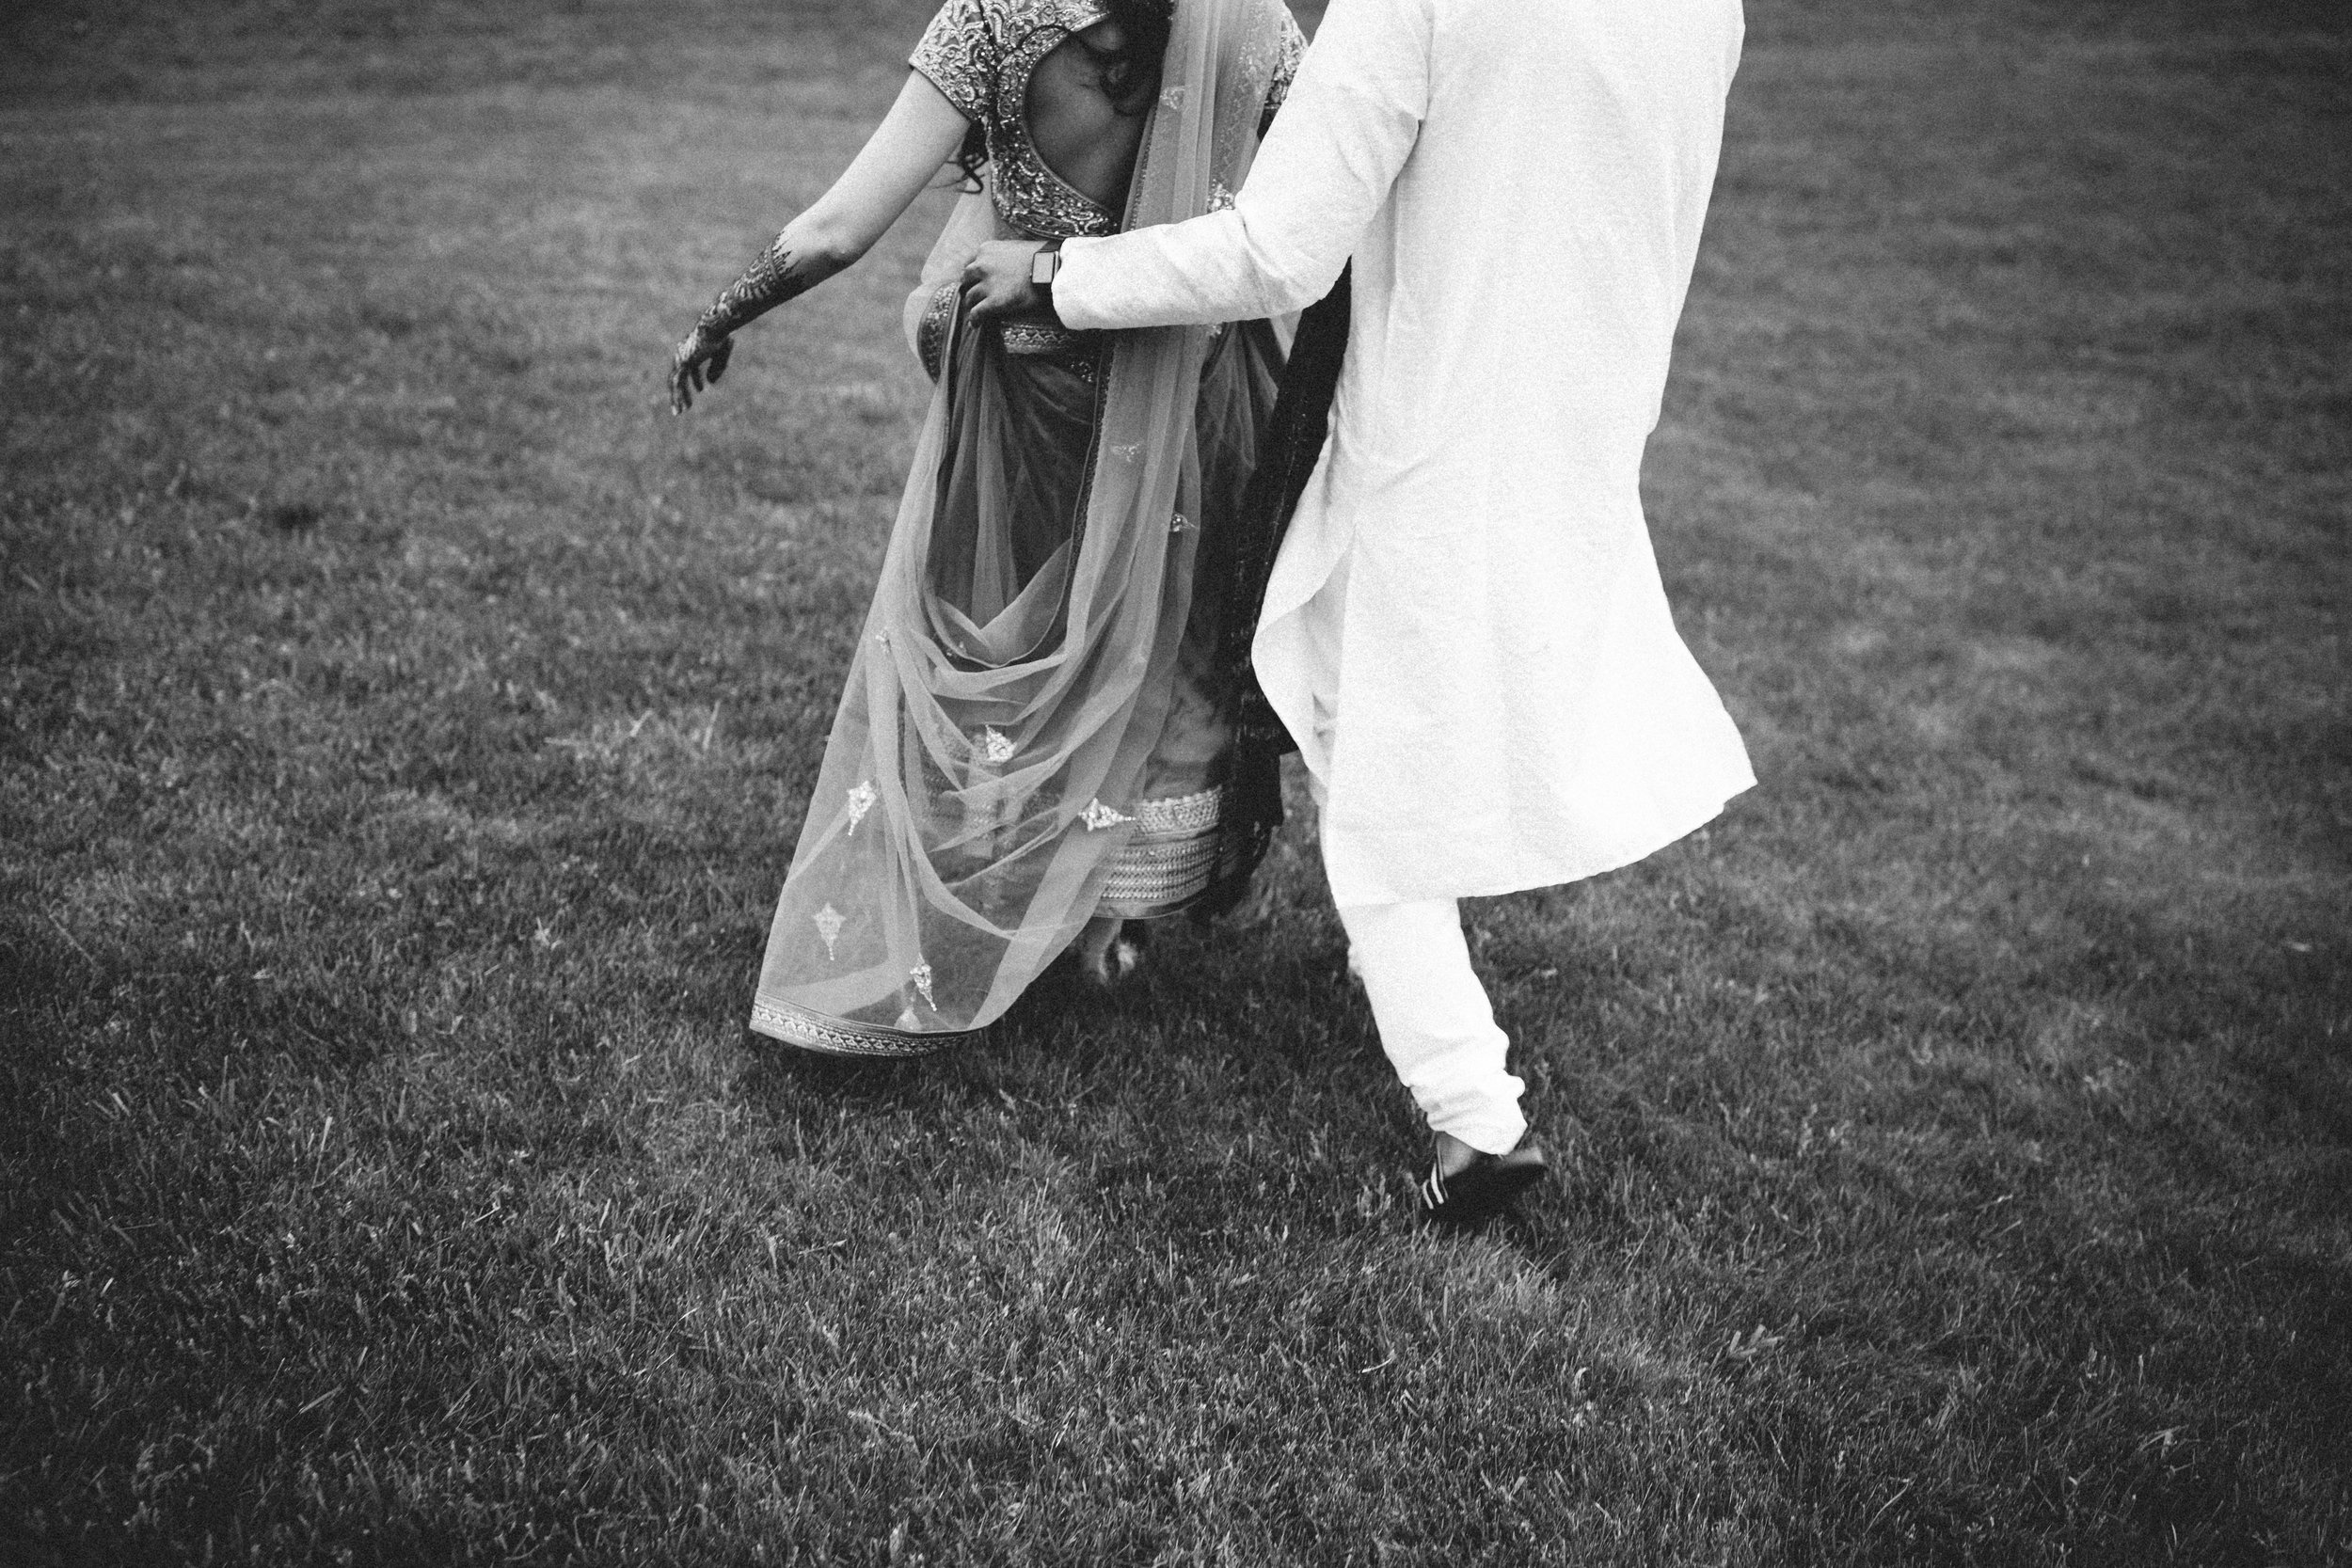 Aparna-Ankit-Patel-Mehndi-Wedding-Photos-0069.jpg